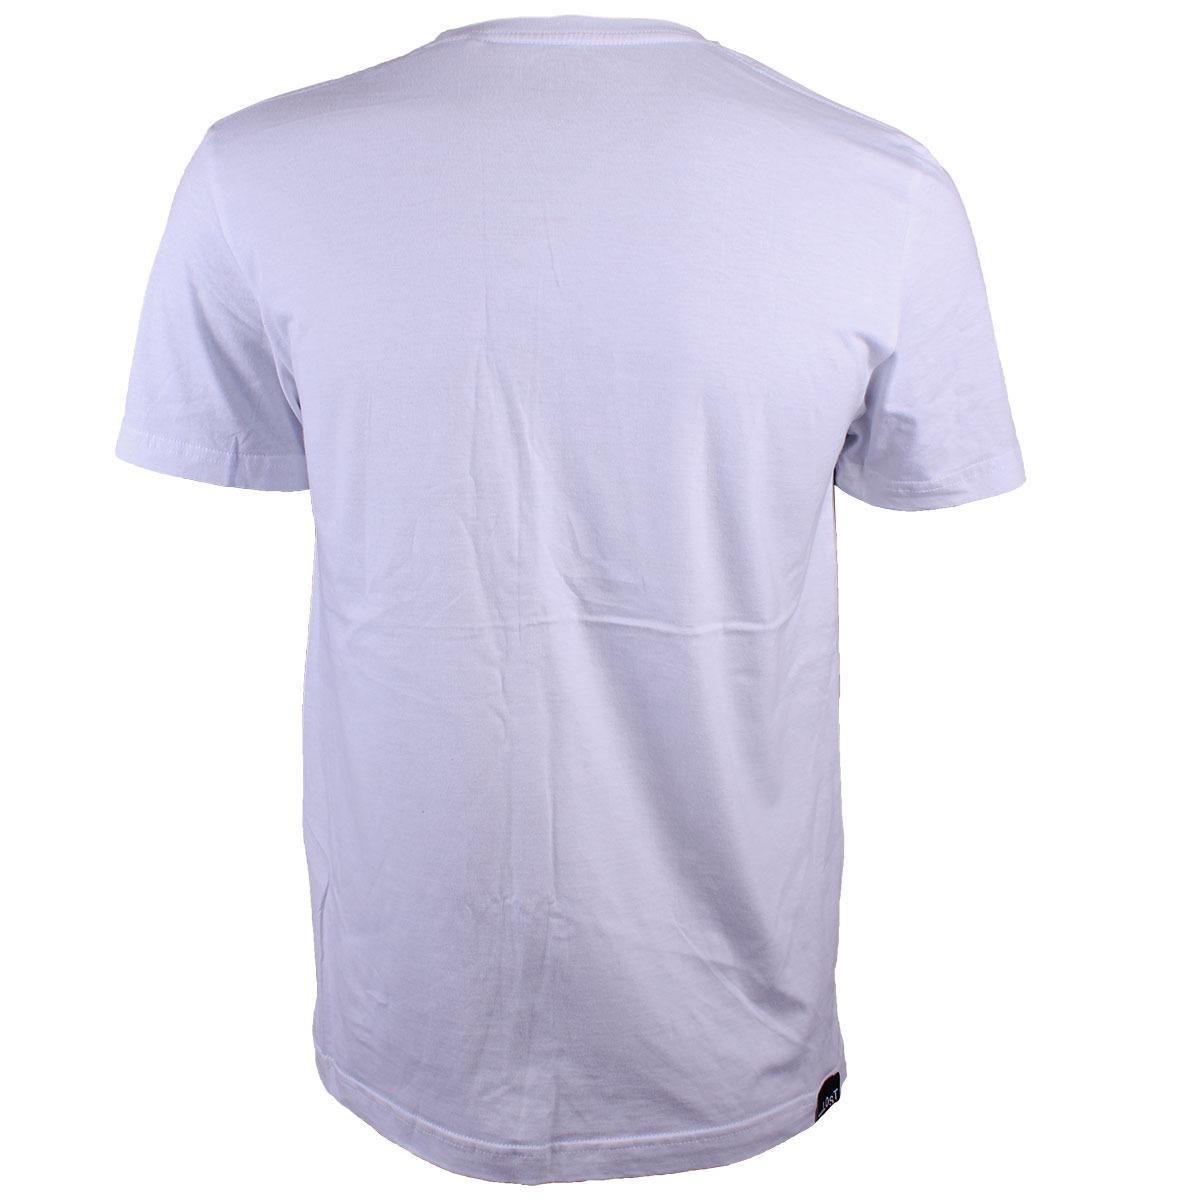 9072d6eab7 camiseta lost porn food mm s branca-m. Carregando zoom.